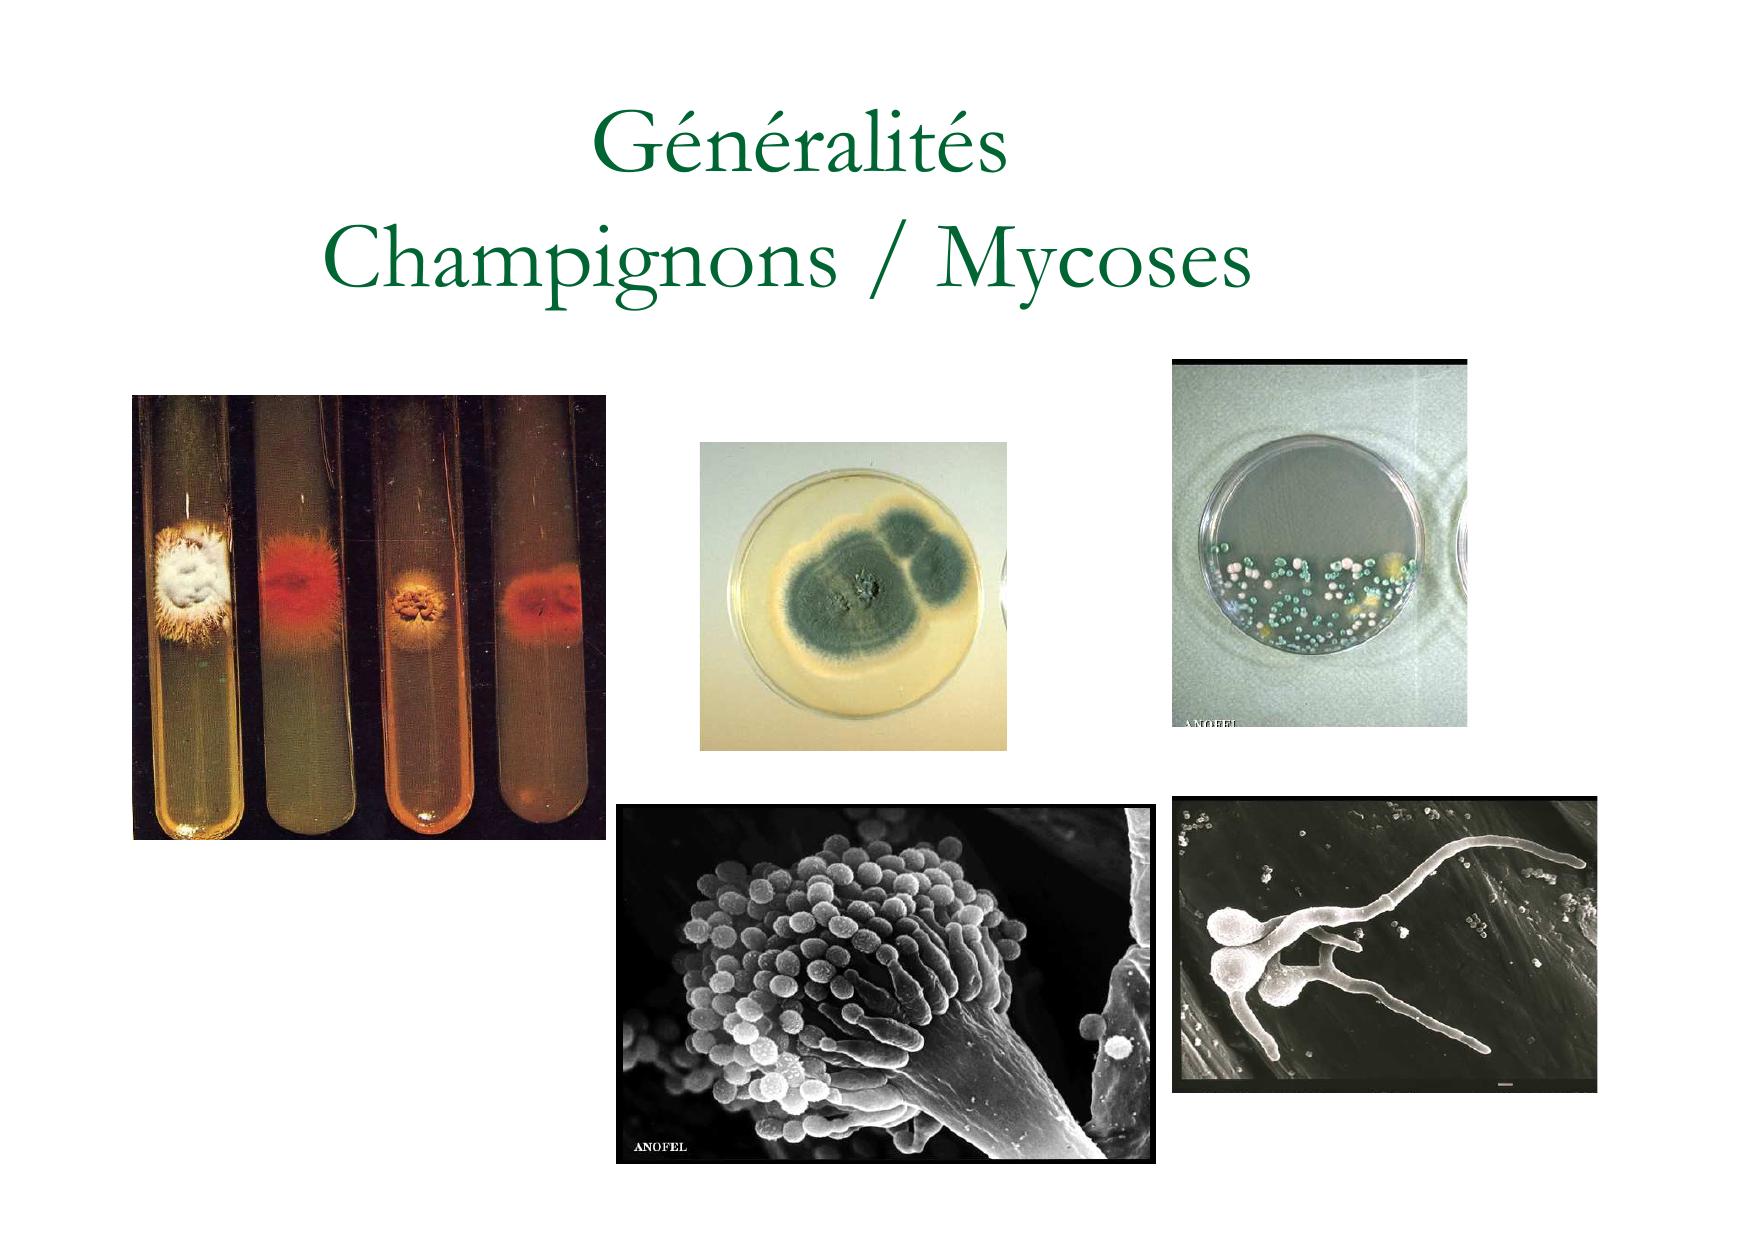 Généralités Champignons / Mycoses